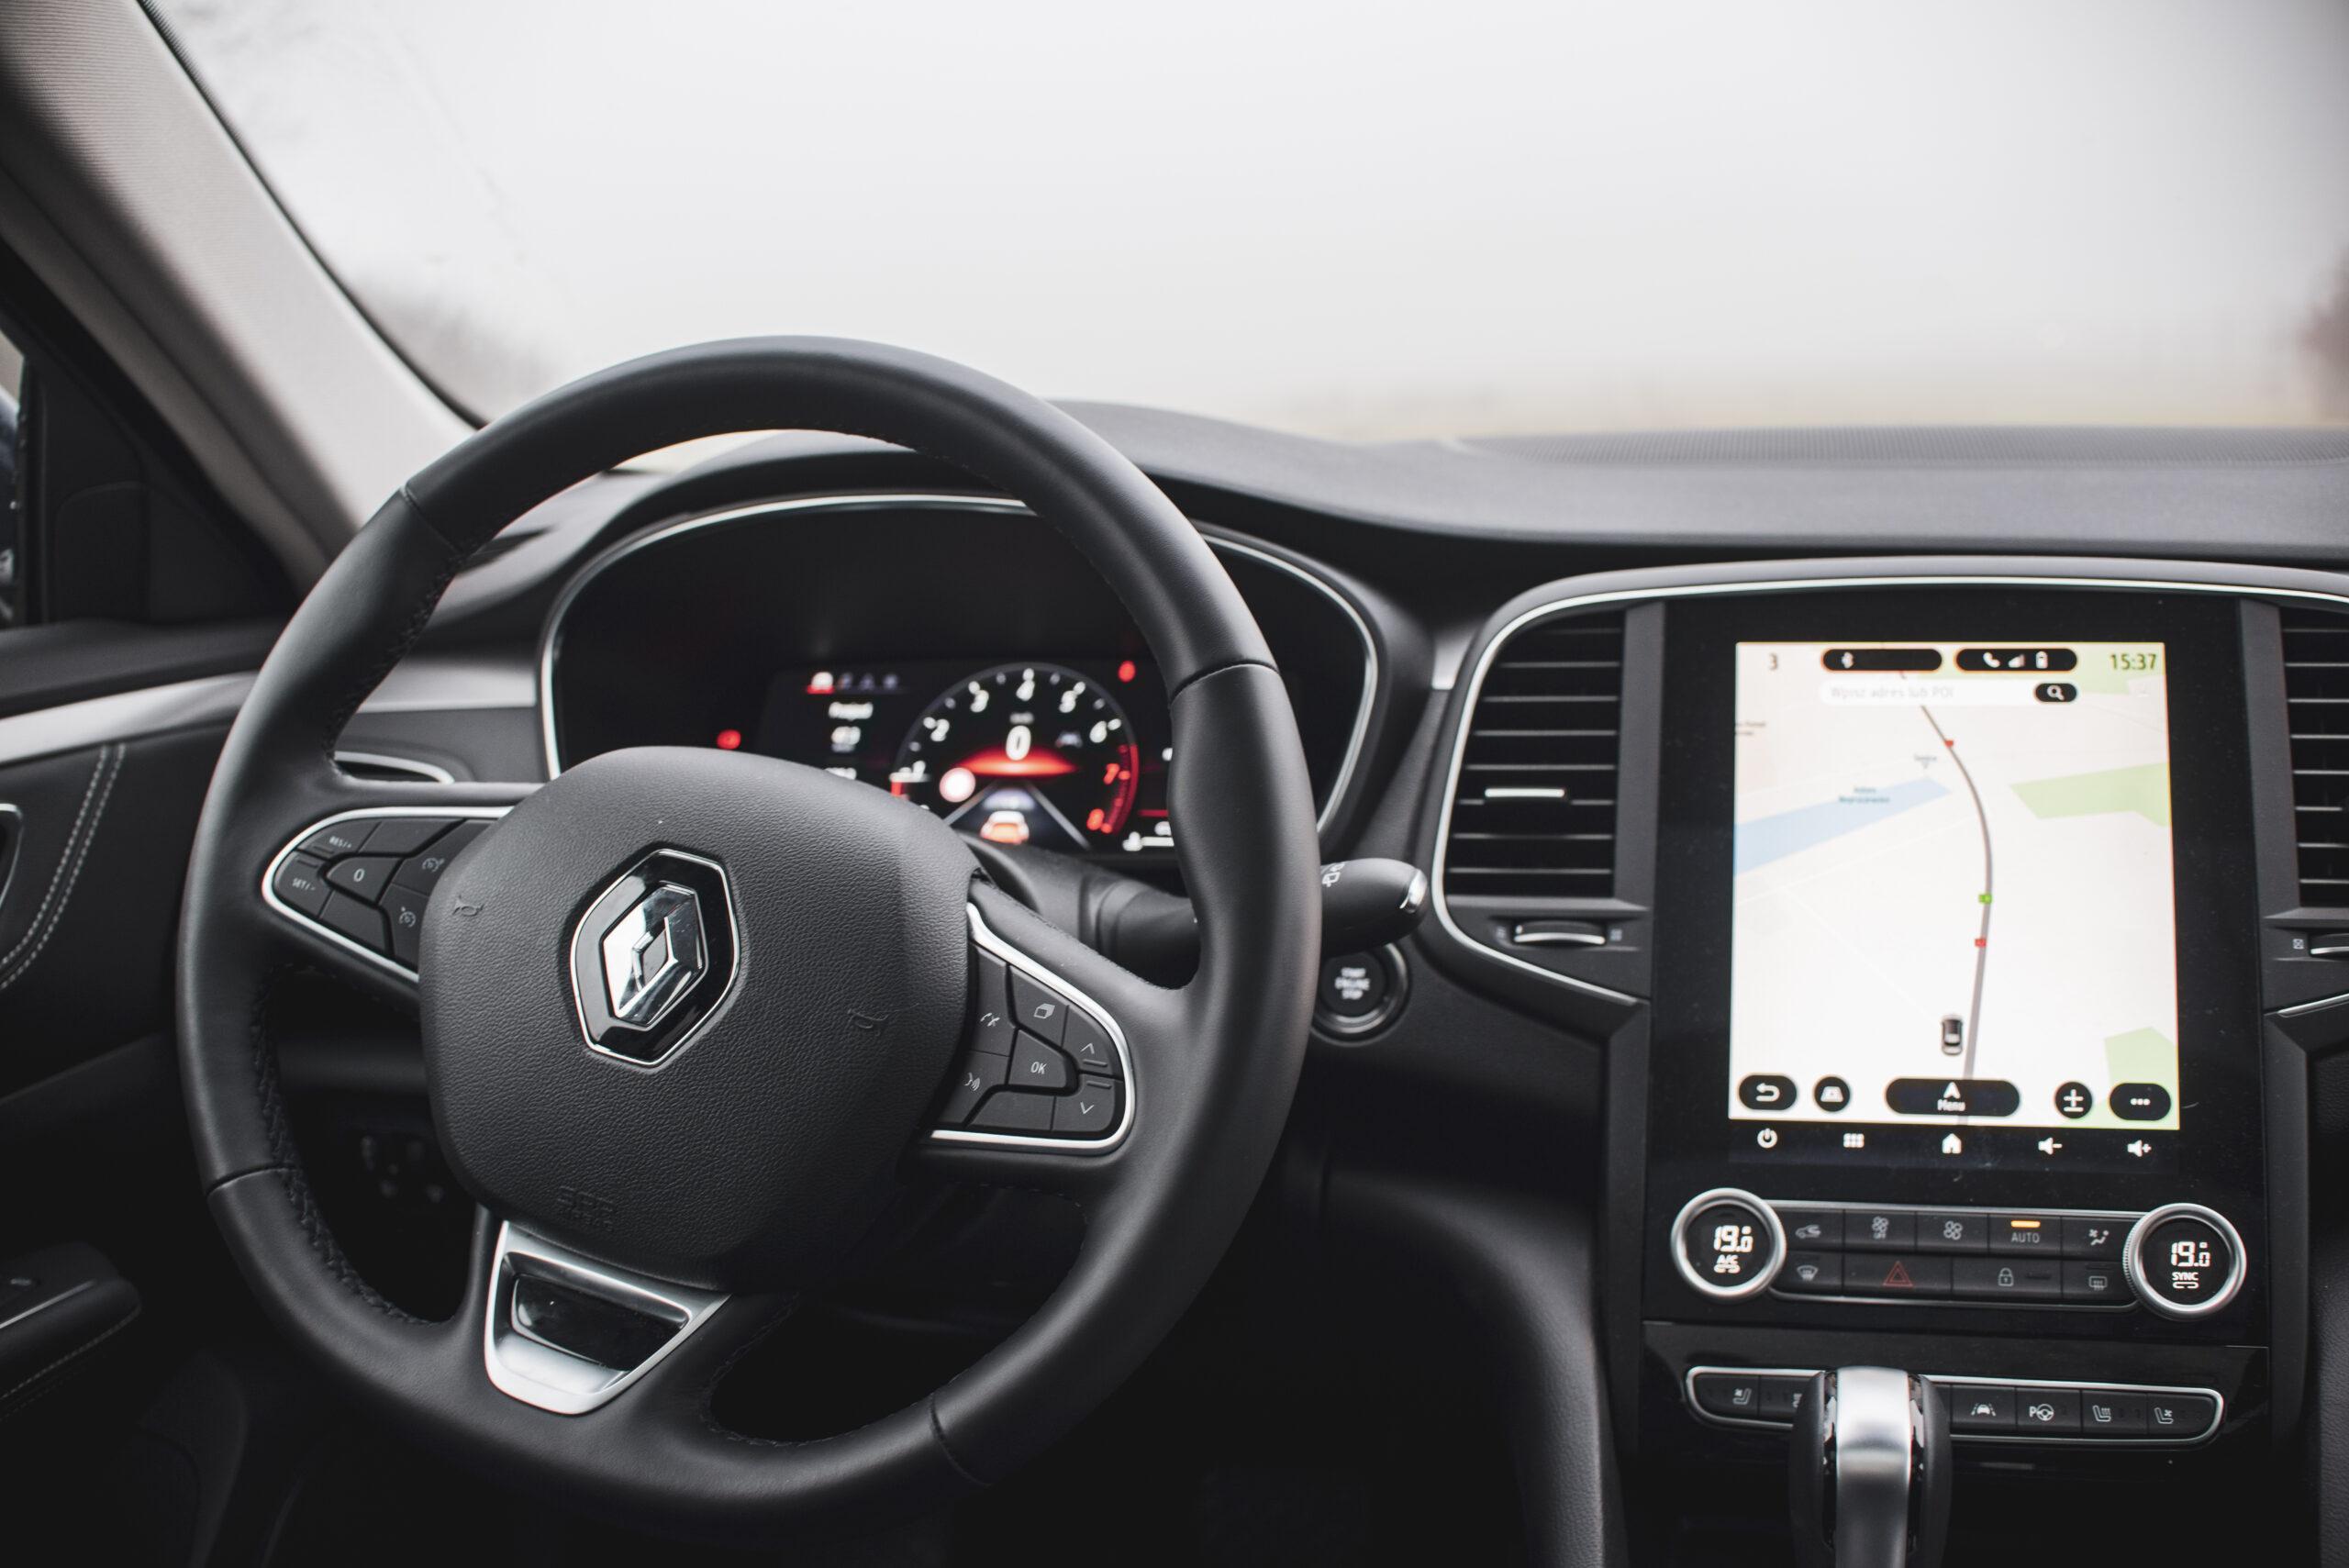 Renault Talisman Grandtour Intens 1.3 TCE 160 KM